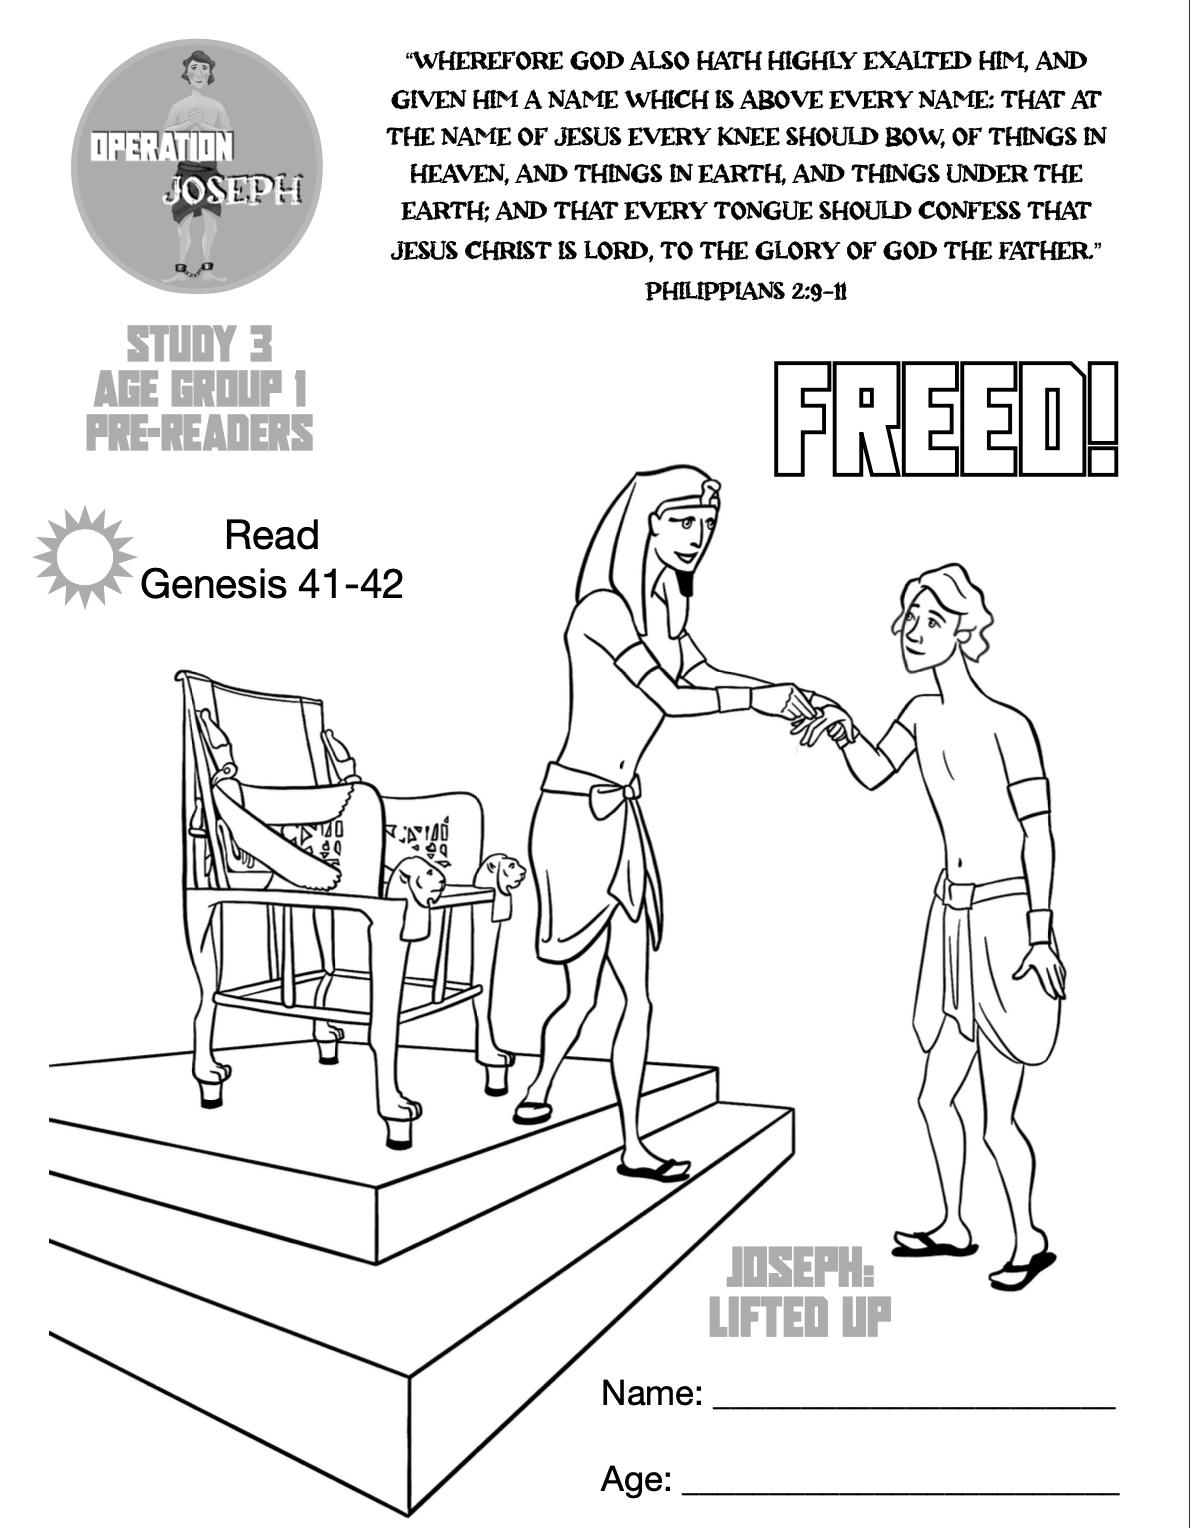 OJ - Bible Study 3 - Age Group 1